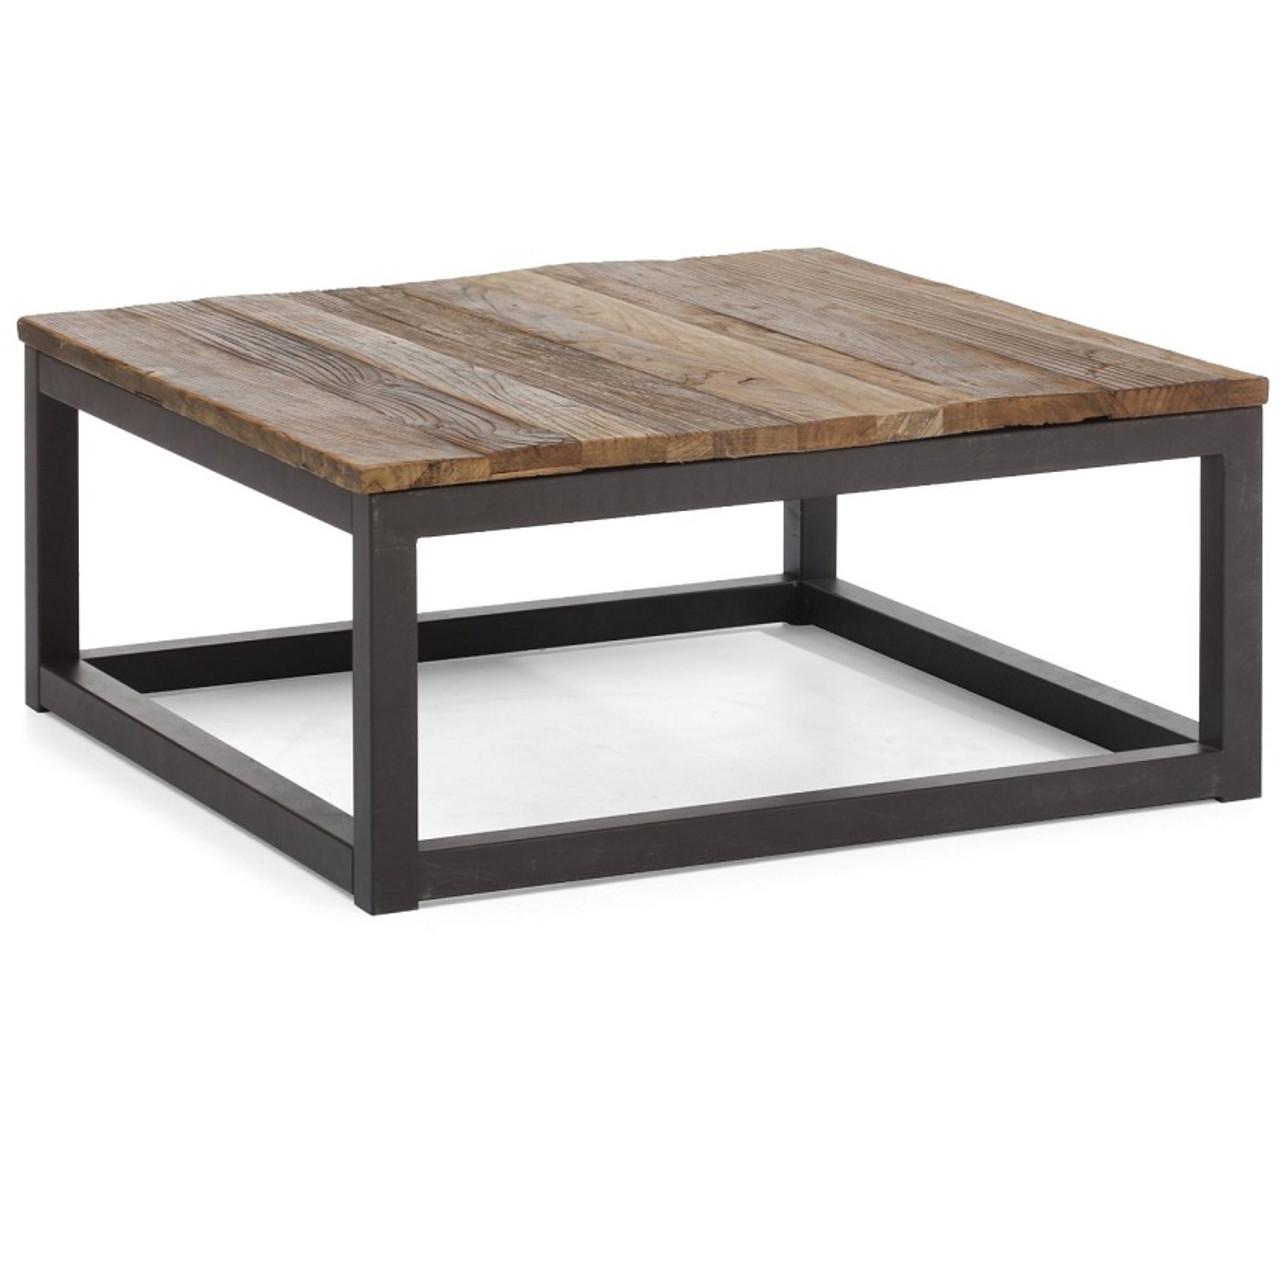 metal coffee table. Civic Wood And Metal Square Coffee Table E